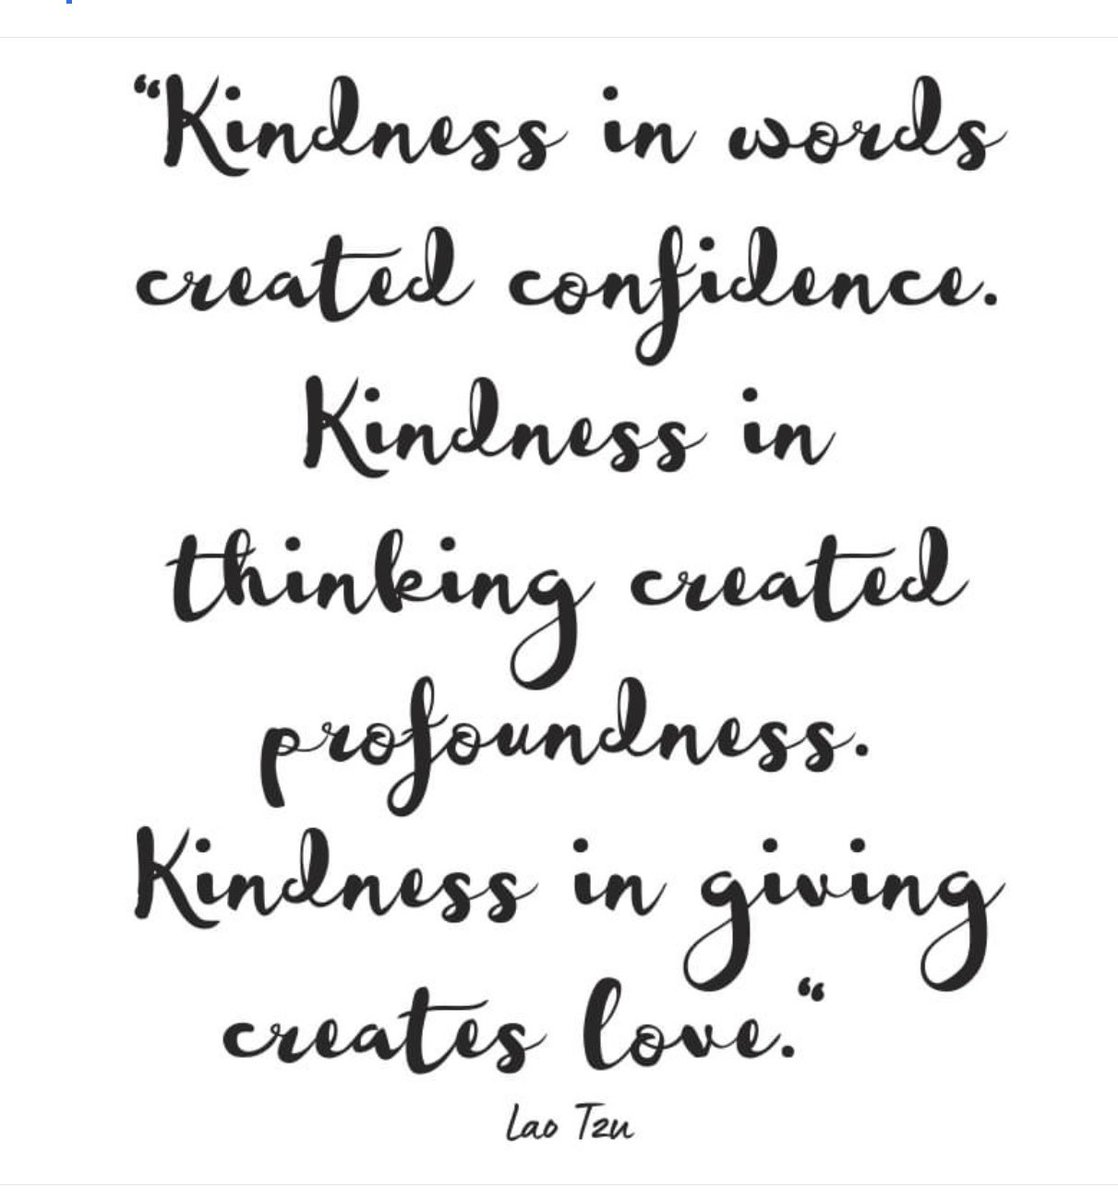 #KindnessMatters 🤍🖤 https://t.co/yCKxNoGIdL